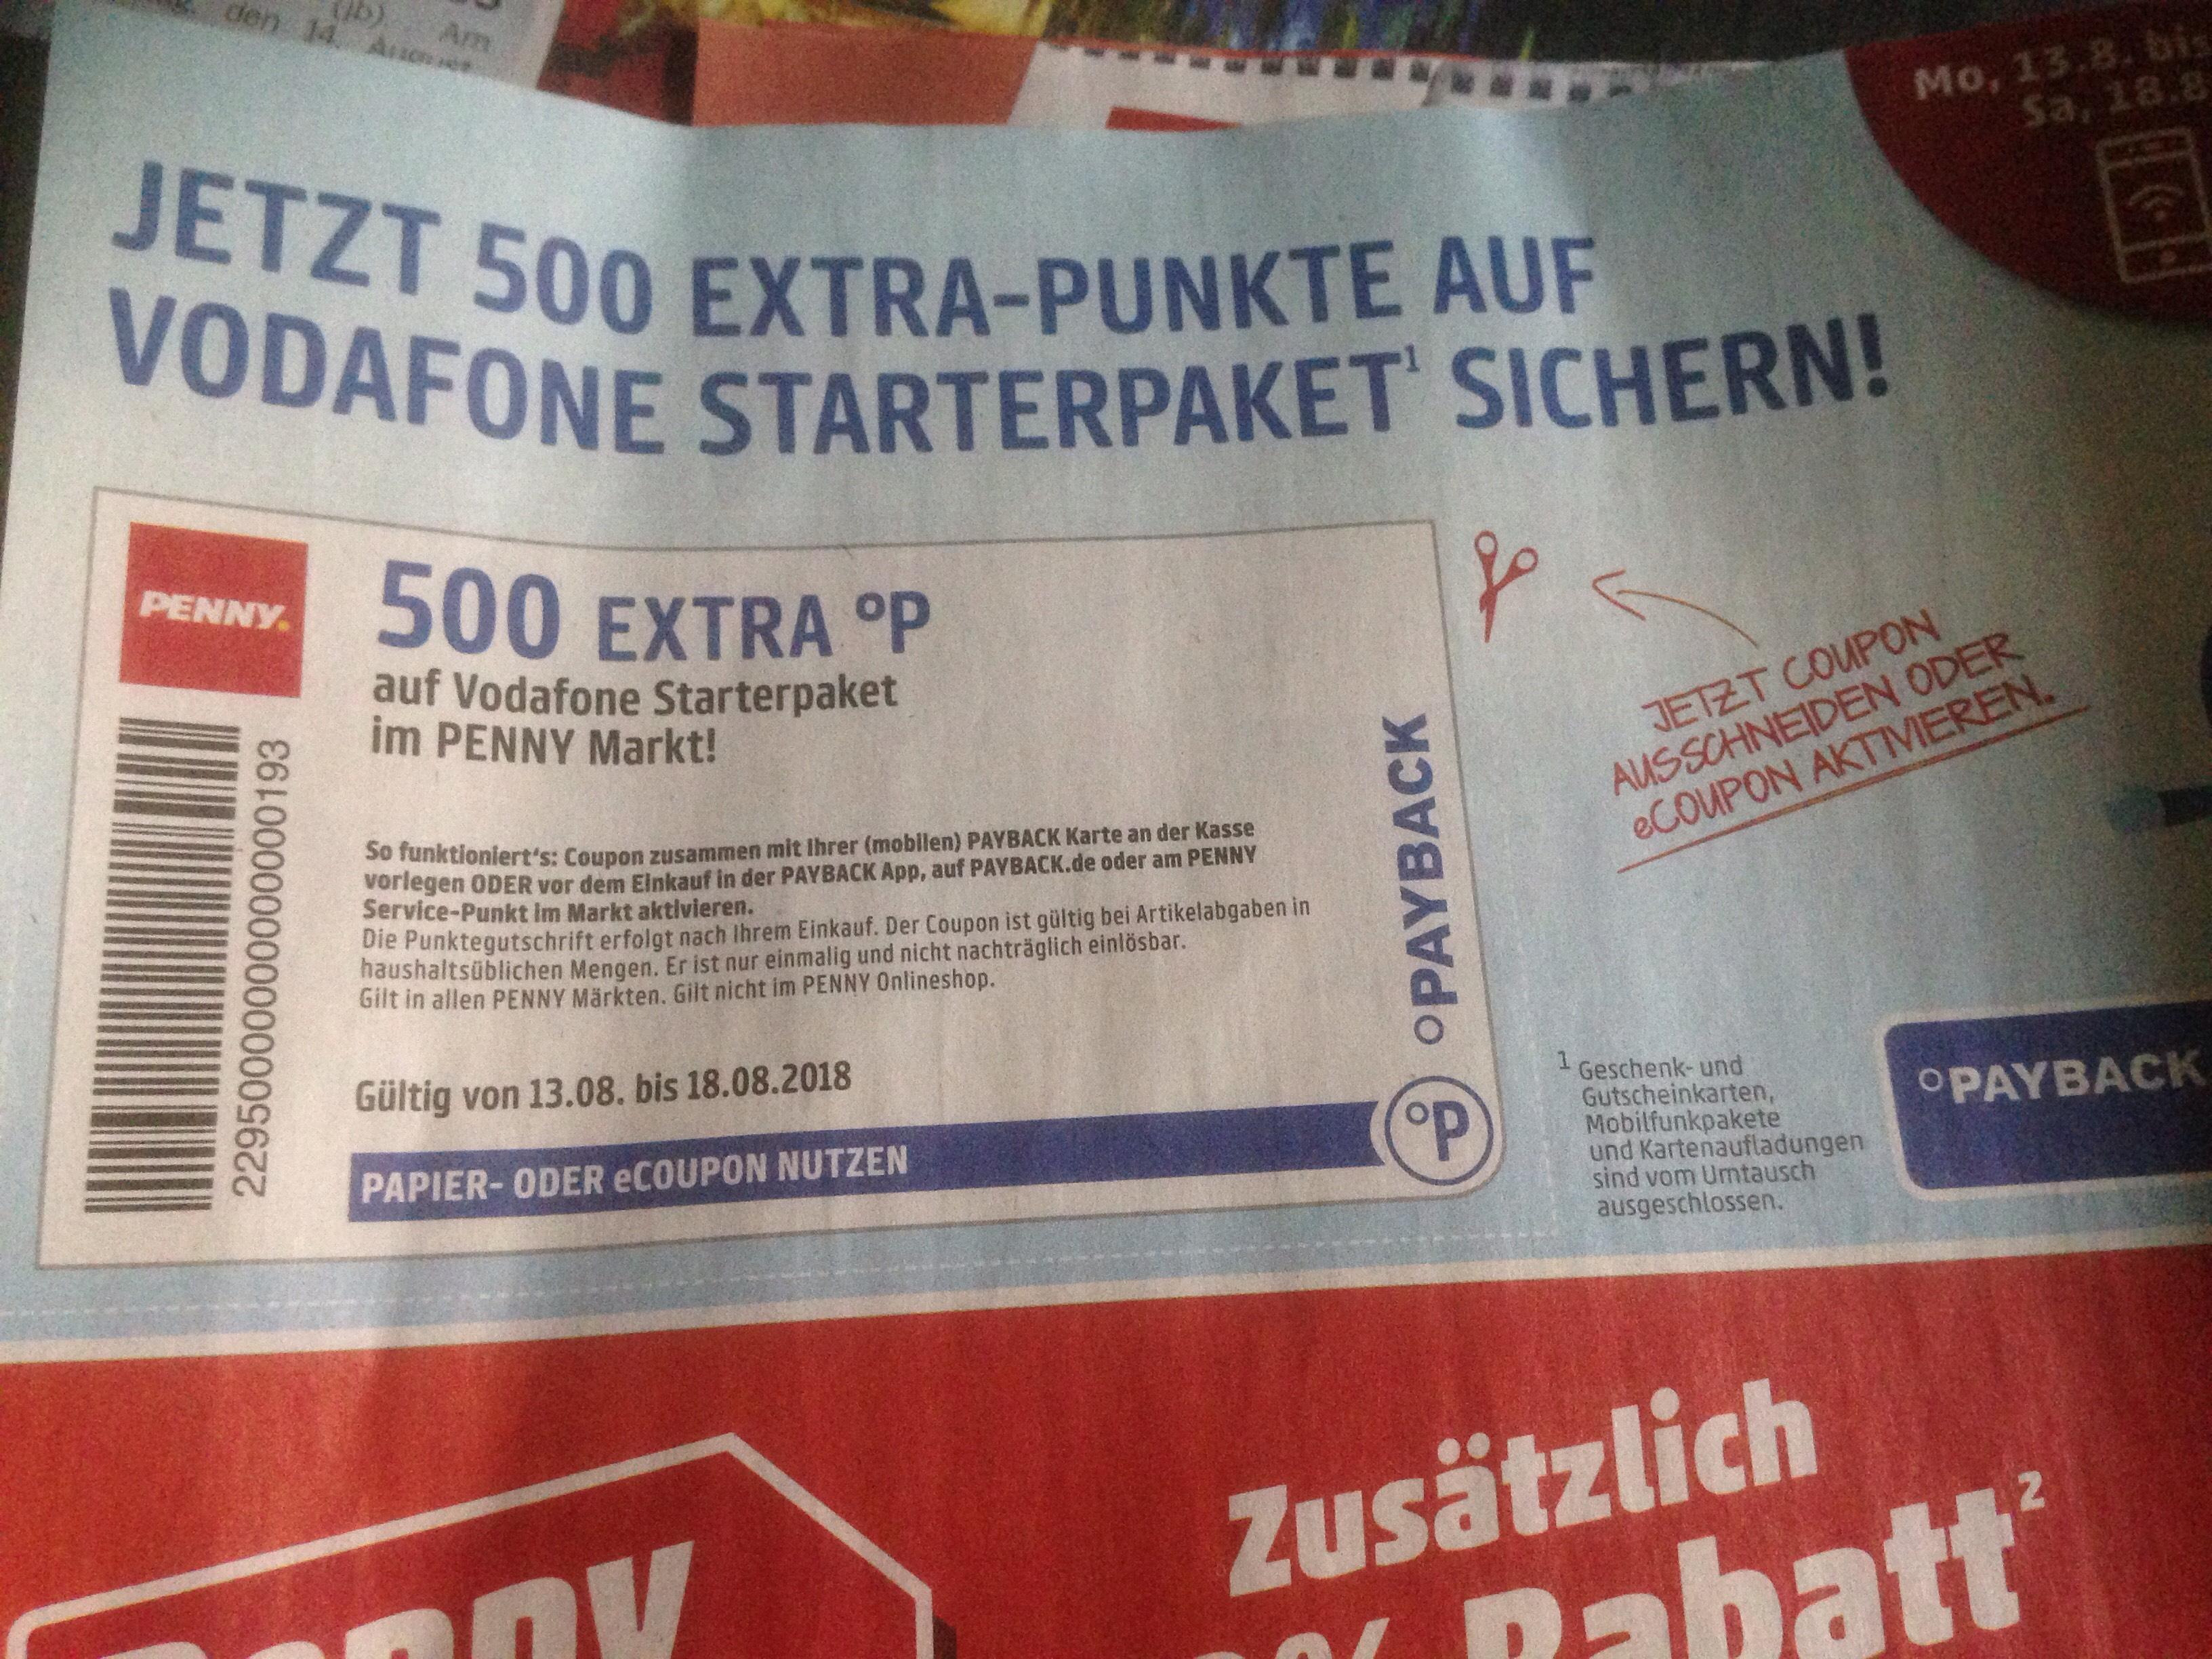 Penny Vodafone Starterpaket holen und 500 Paybackpunkte (5€) kassieren. (Lokal - eventuell Bundesweit)